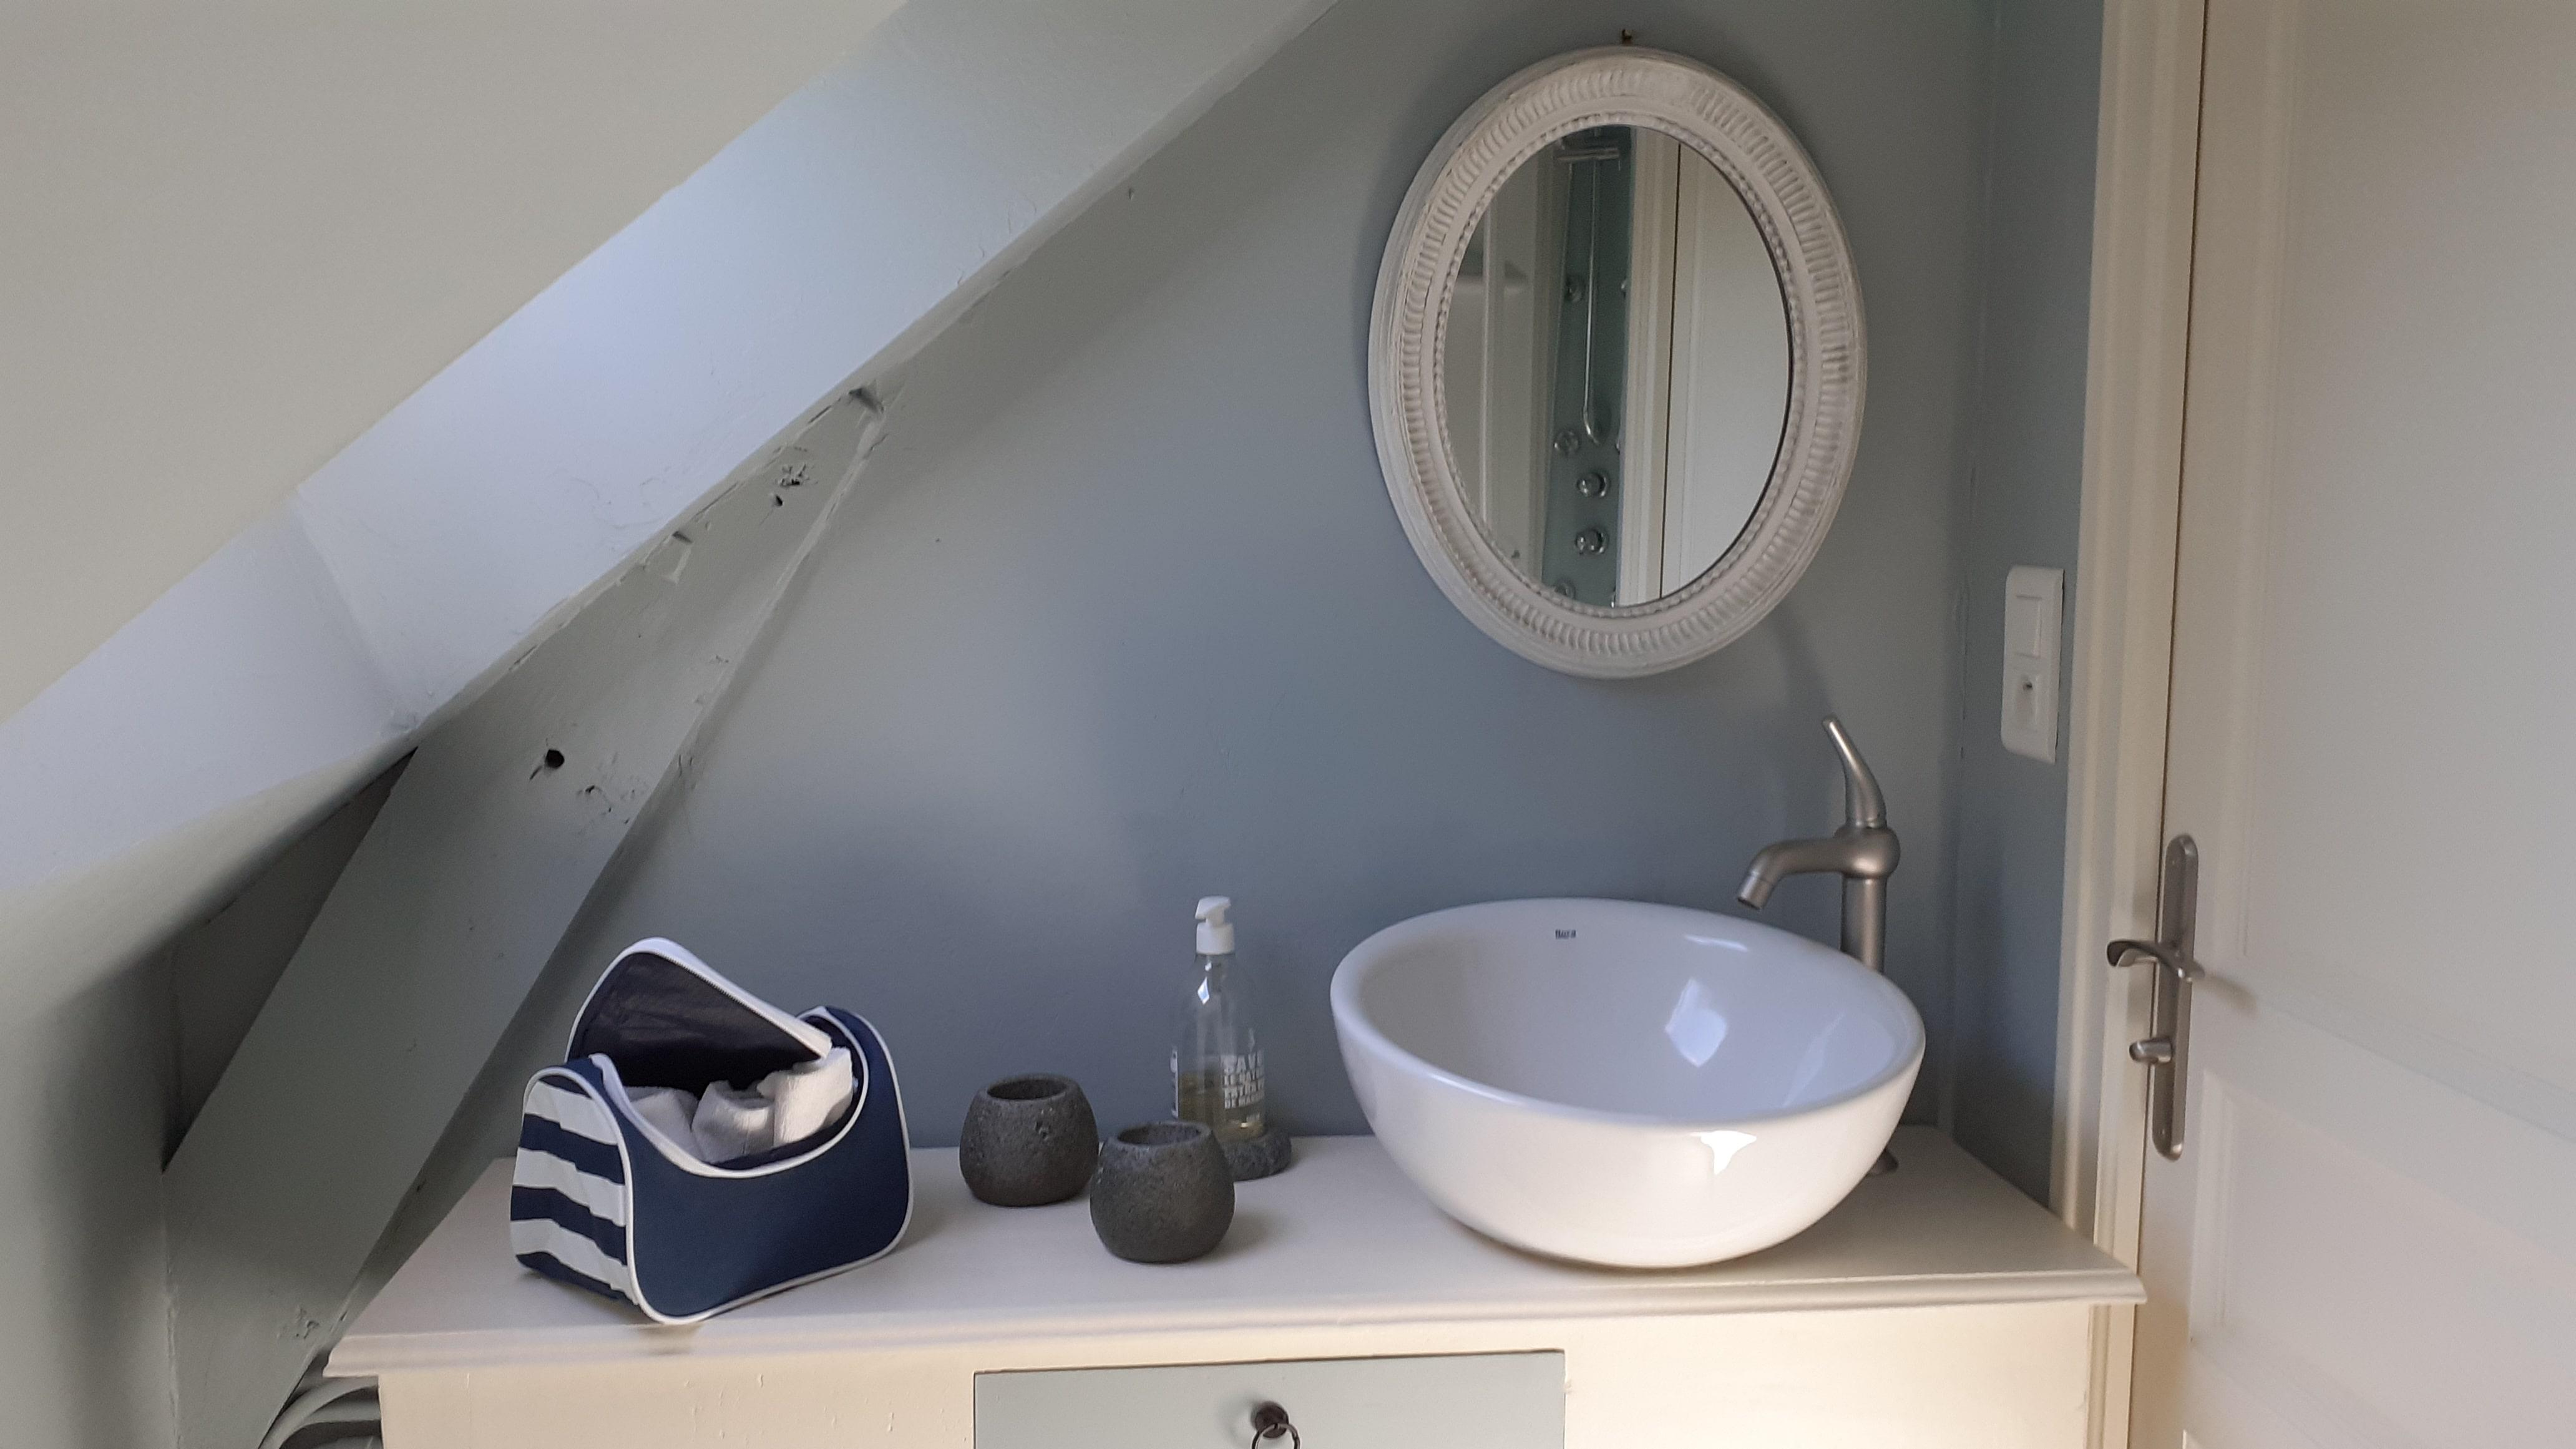 La salle de bain de la chambre avec une grande vasque.